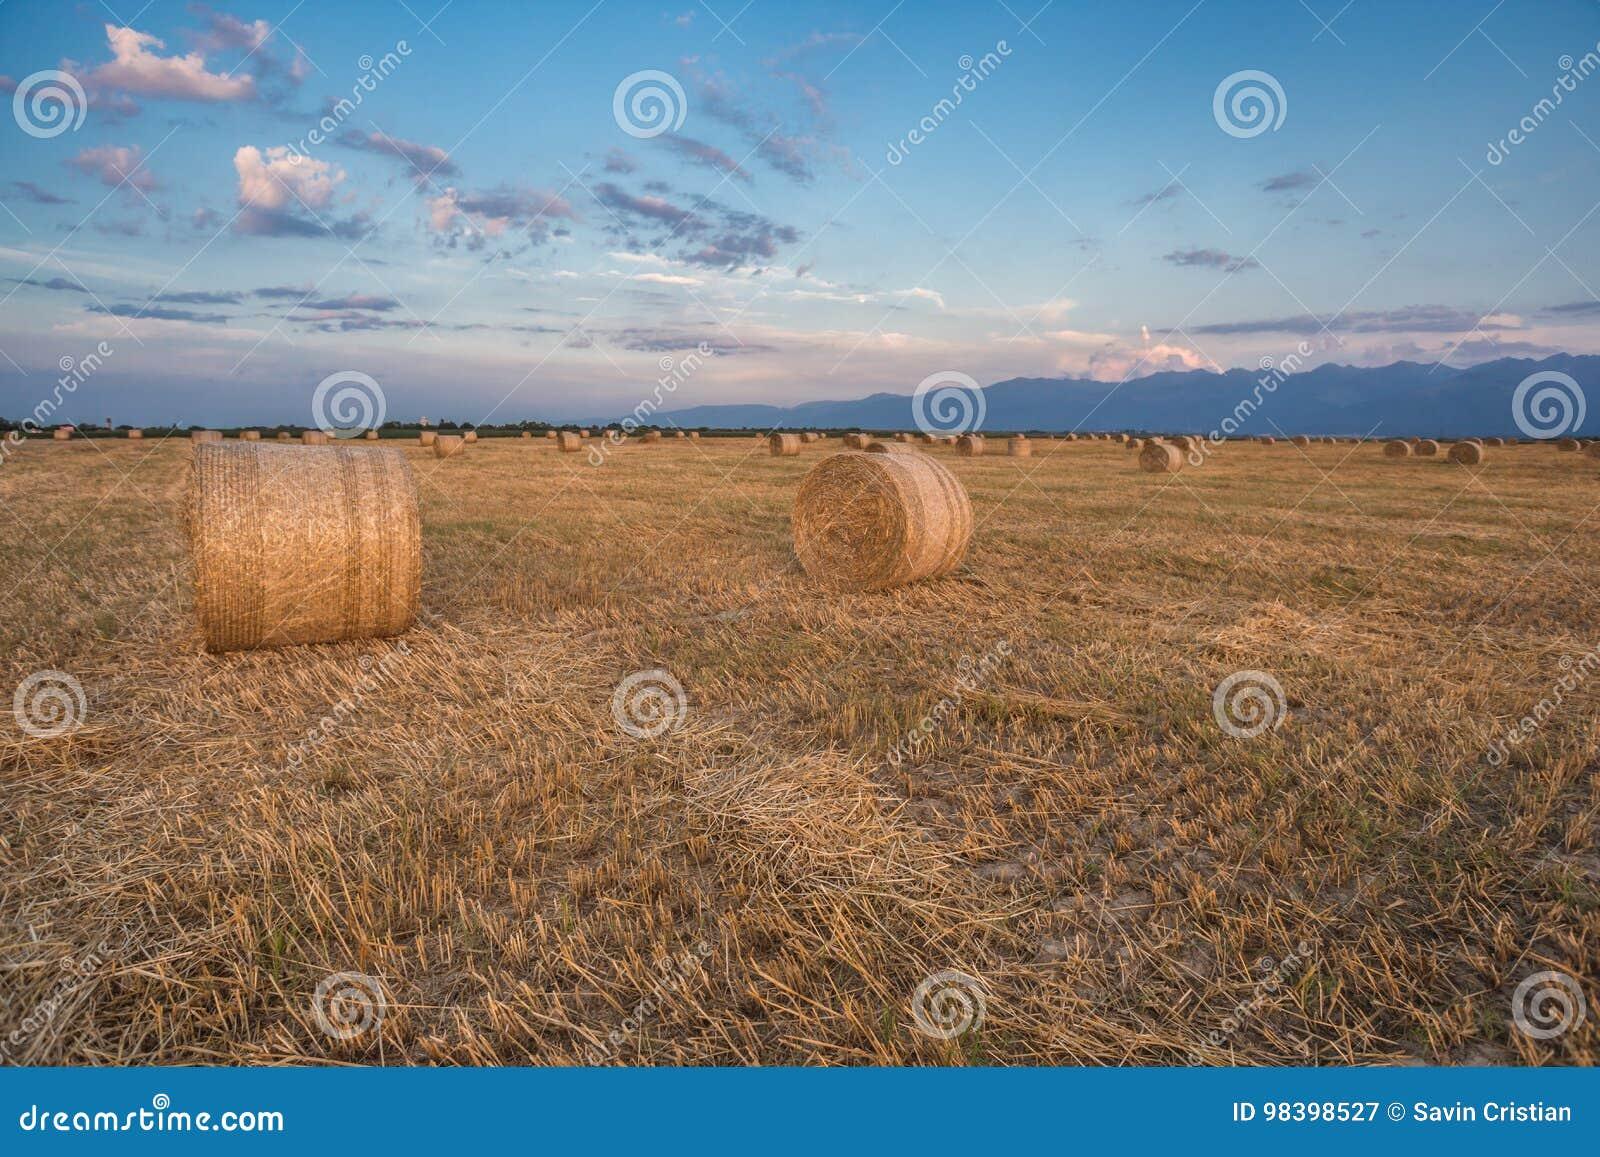 Baled Hay Rolls At Sunset Stock Image Image Of Bale 98398527